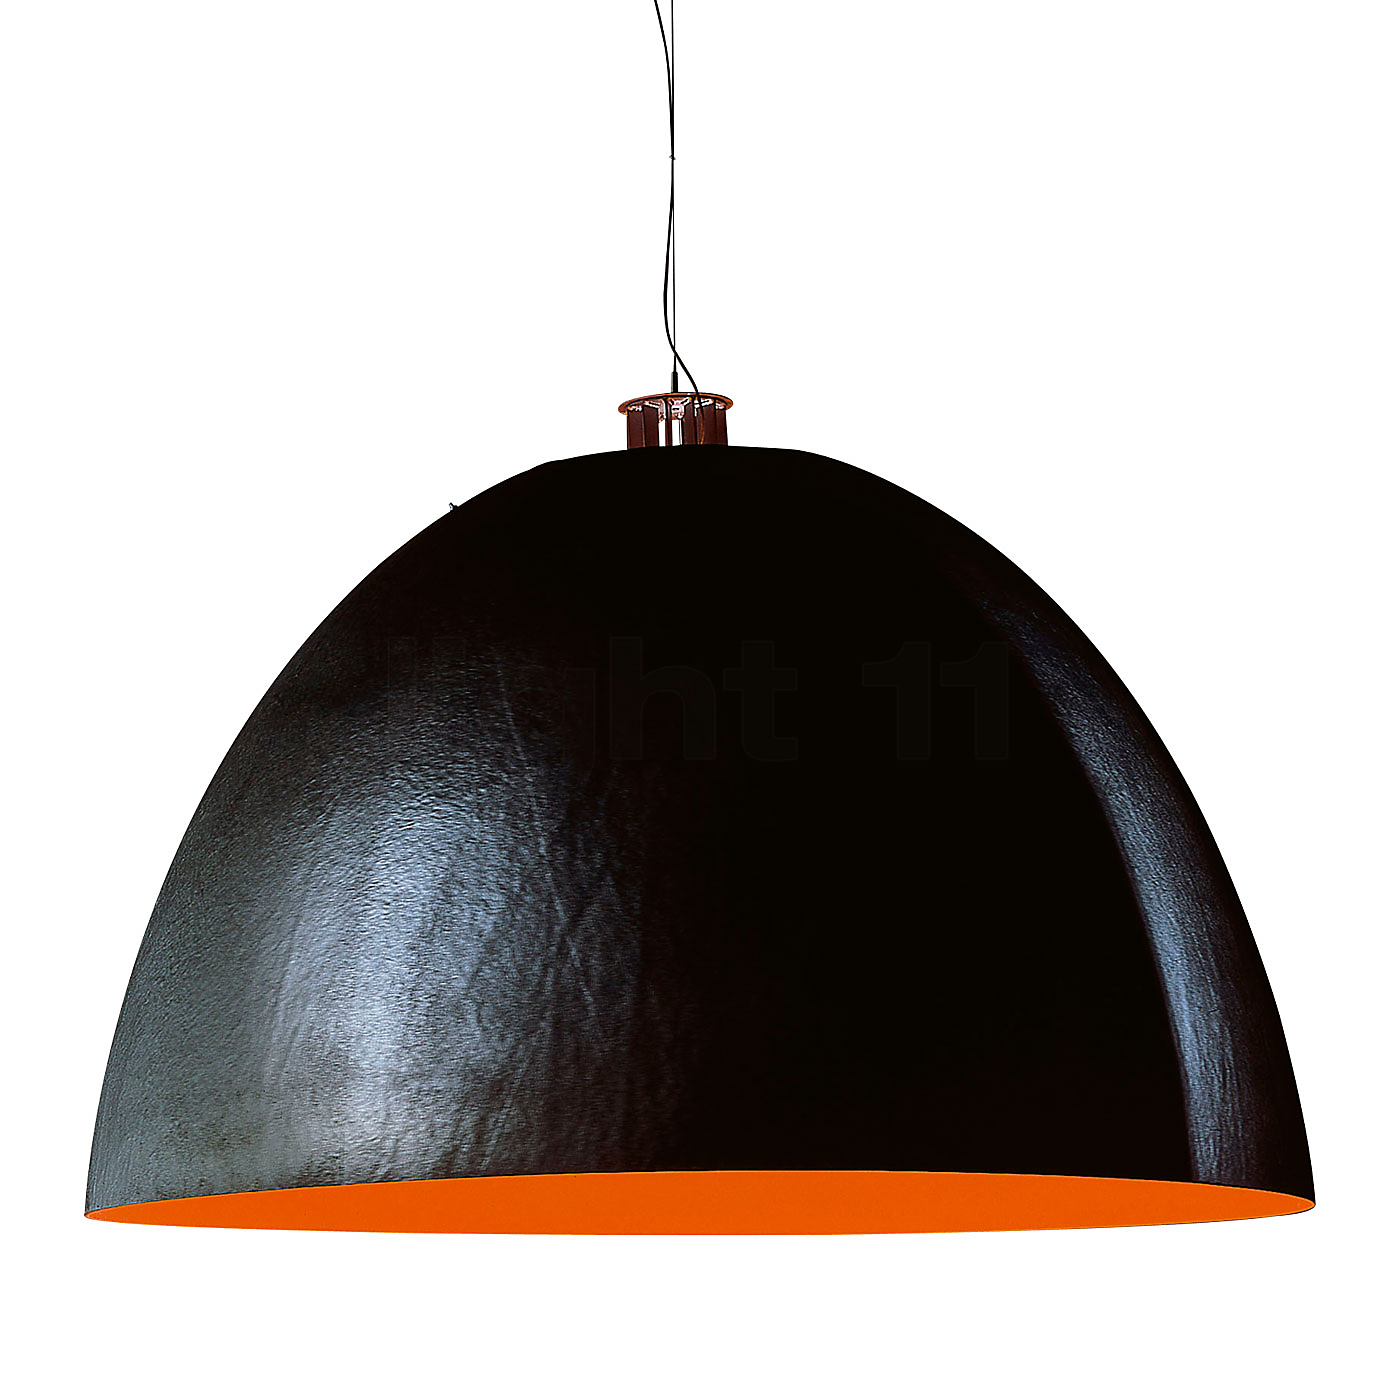 ingo maurer xxl dome dining table lamps buy at. Black Bedroom Furniture Sets. Home Design Ideas